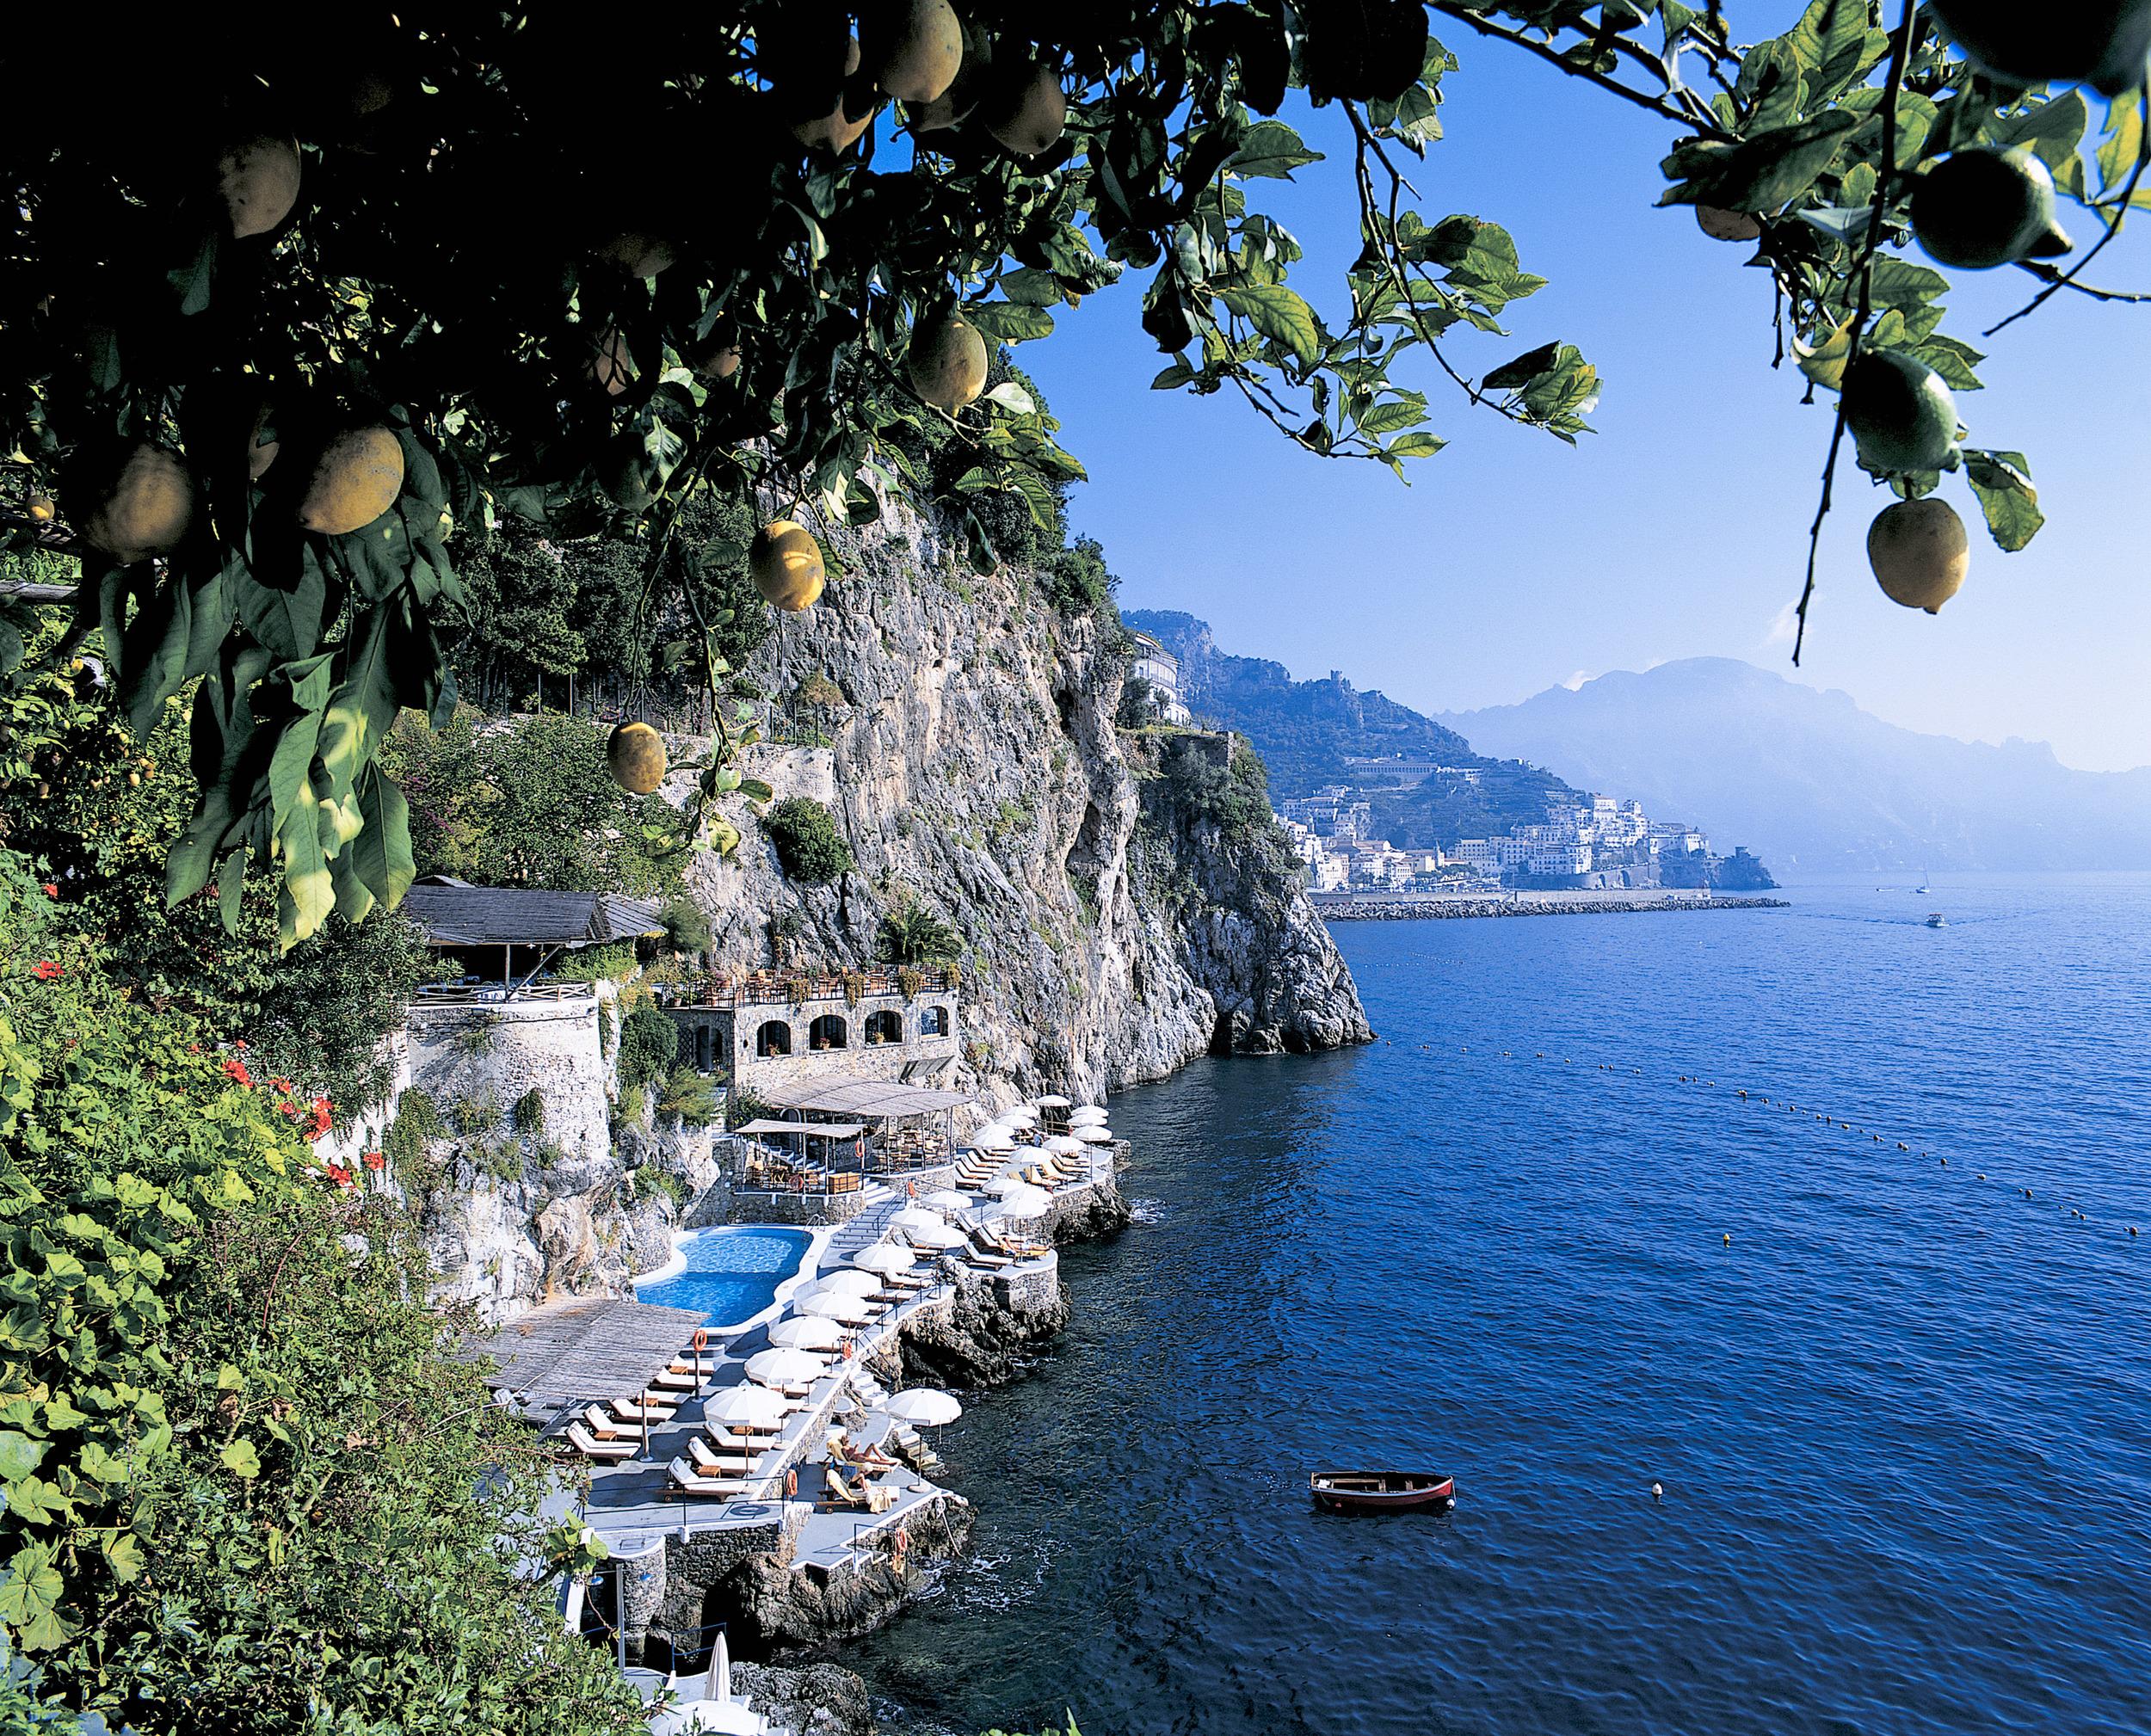 Image property of Santa Caterina